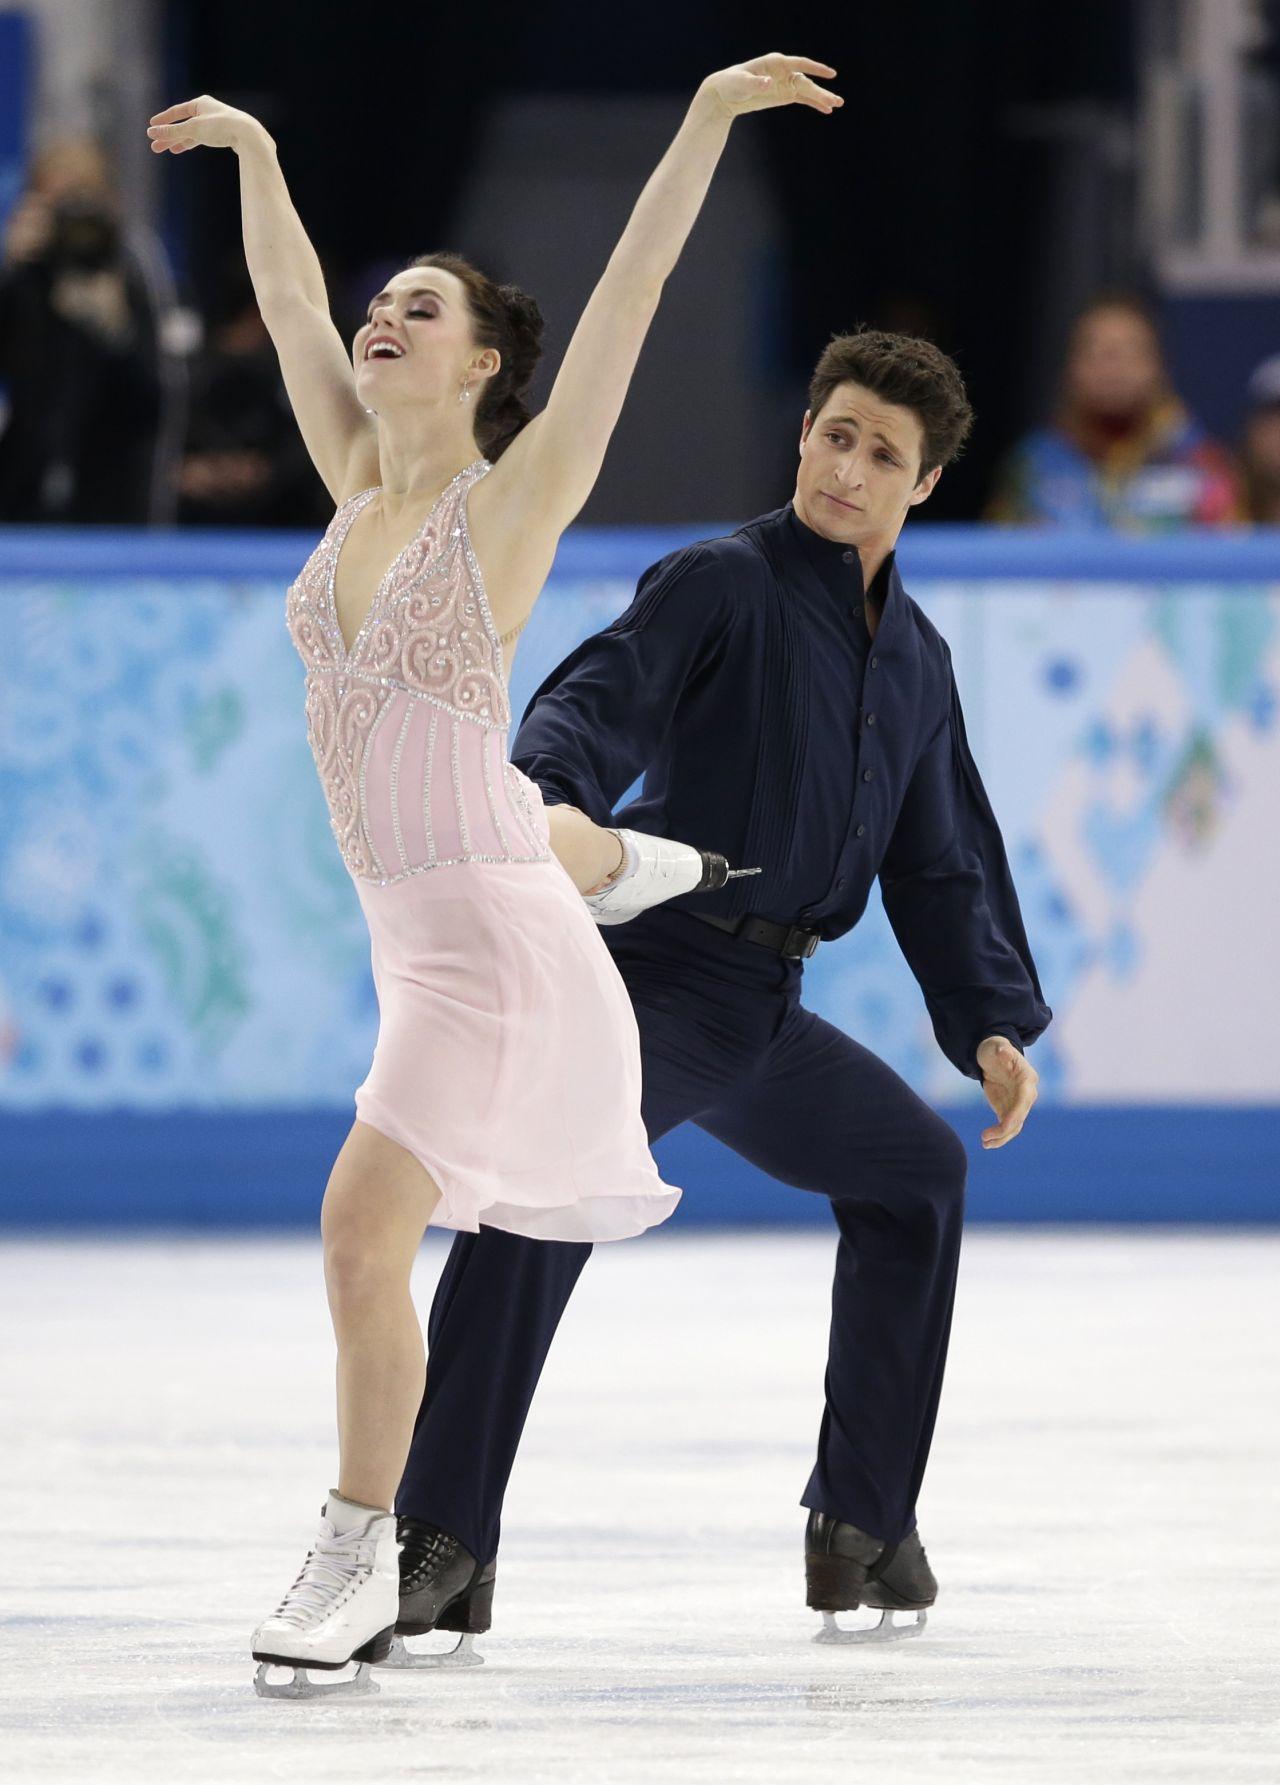 Tessa Virtue 2014 Sochi Winter Olympics Figure Skating